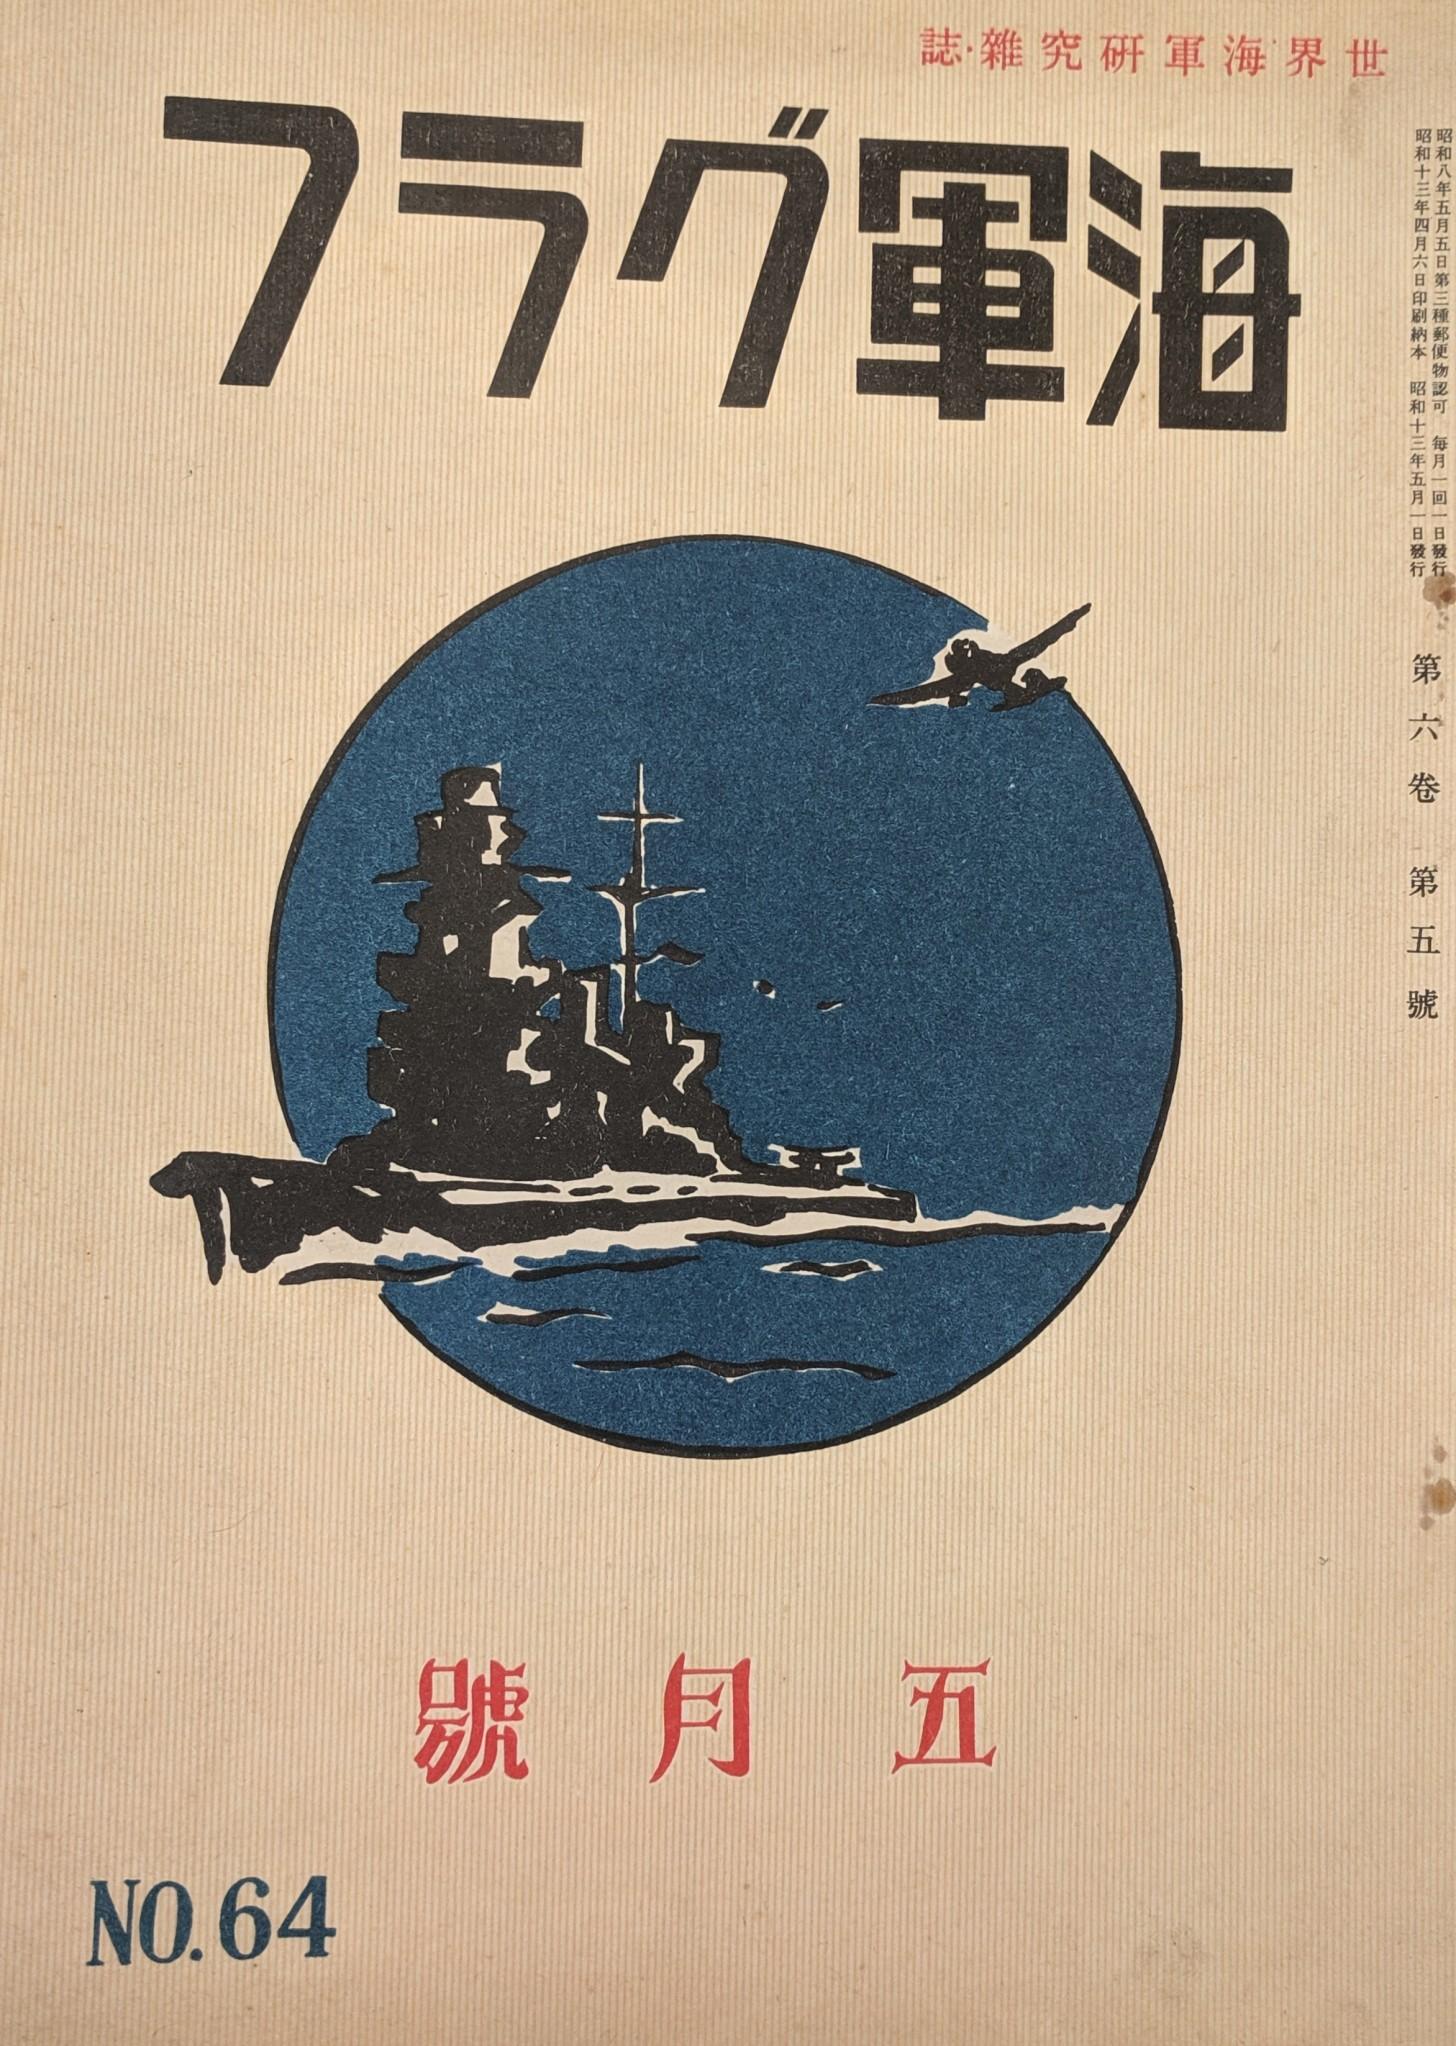 Kaigun Gurafu May 1938